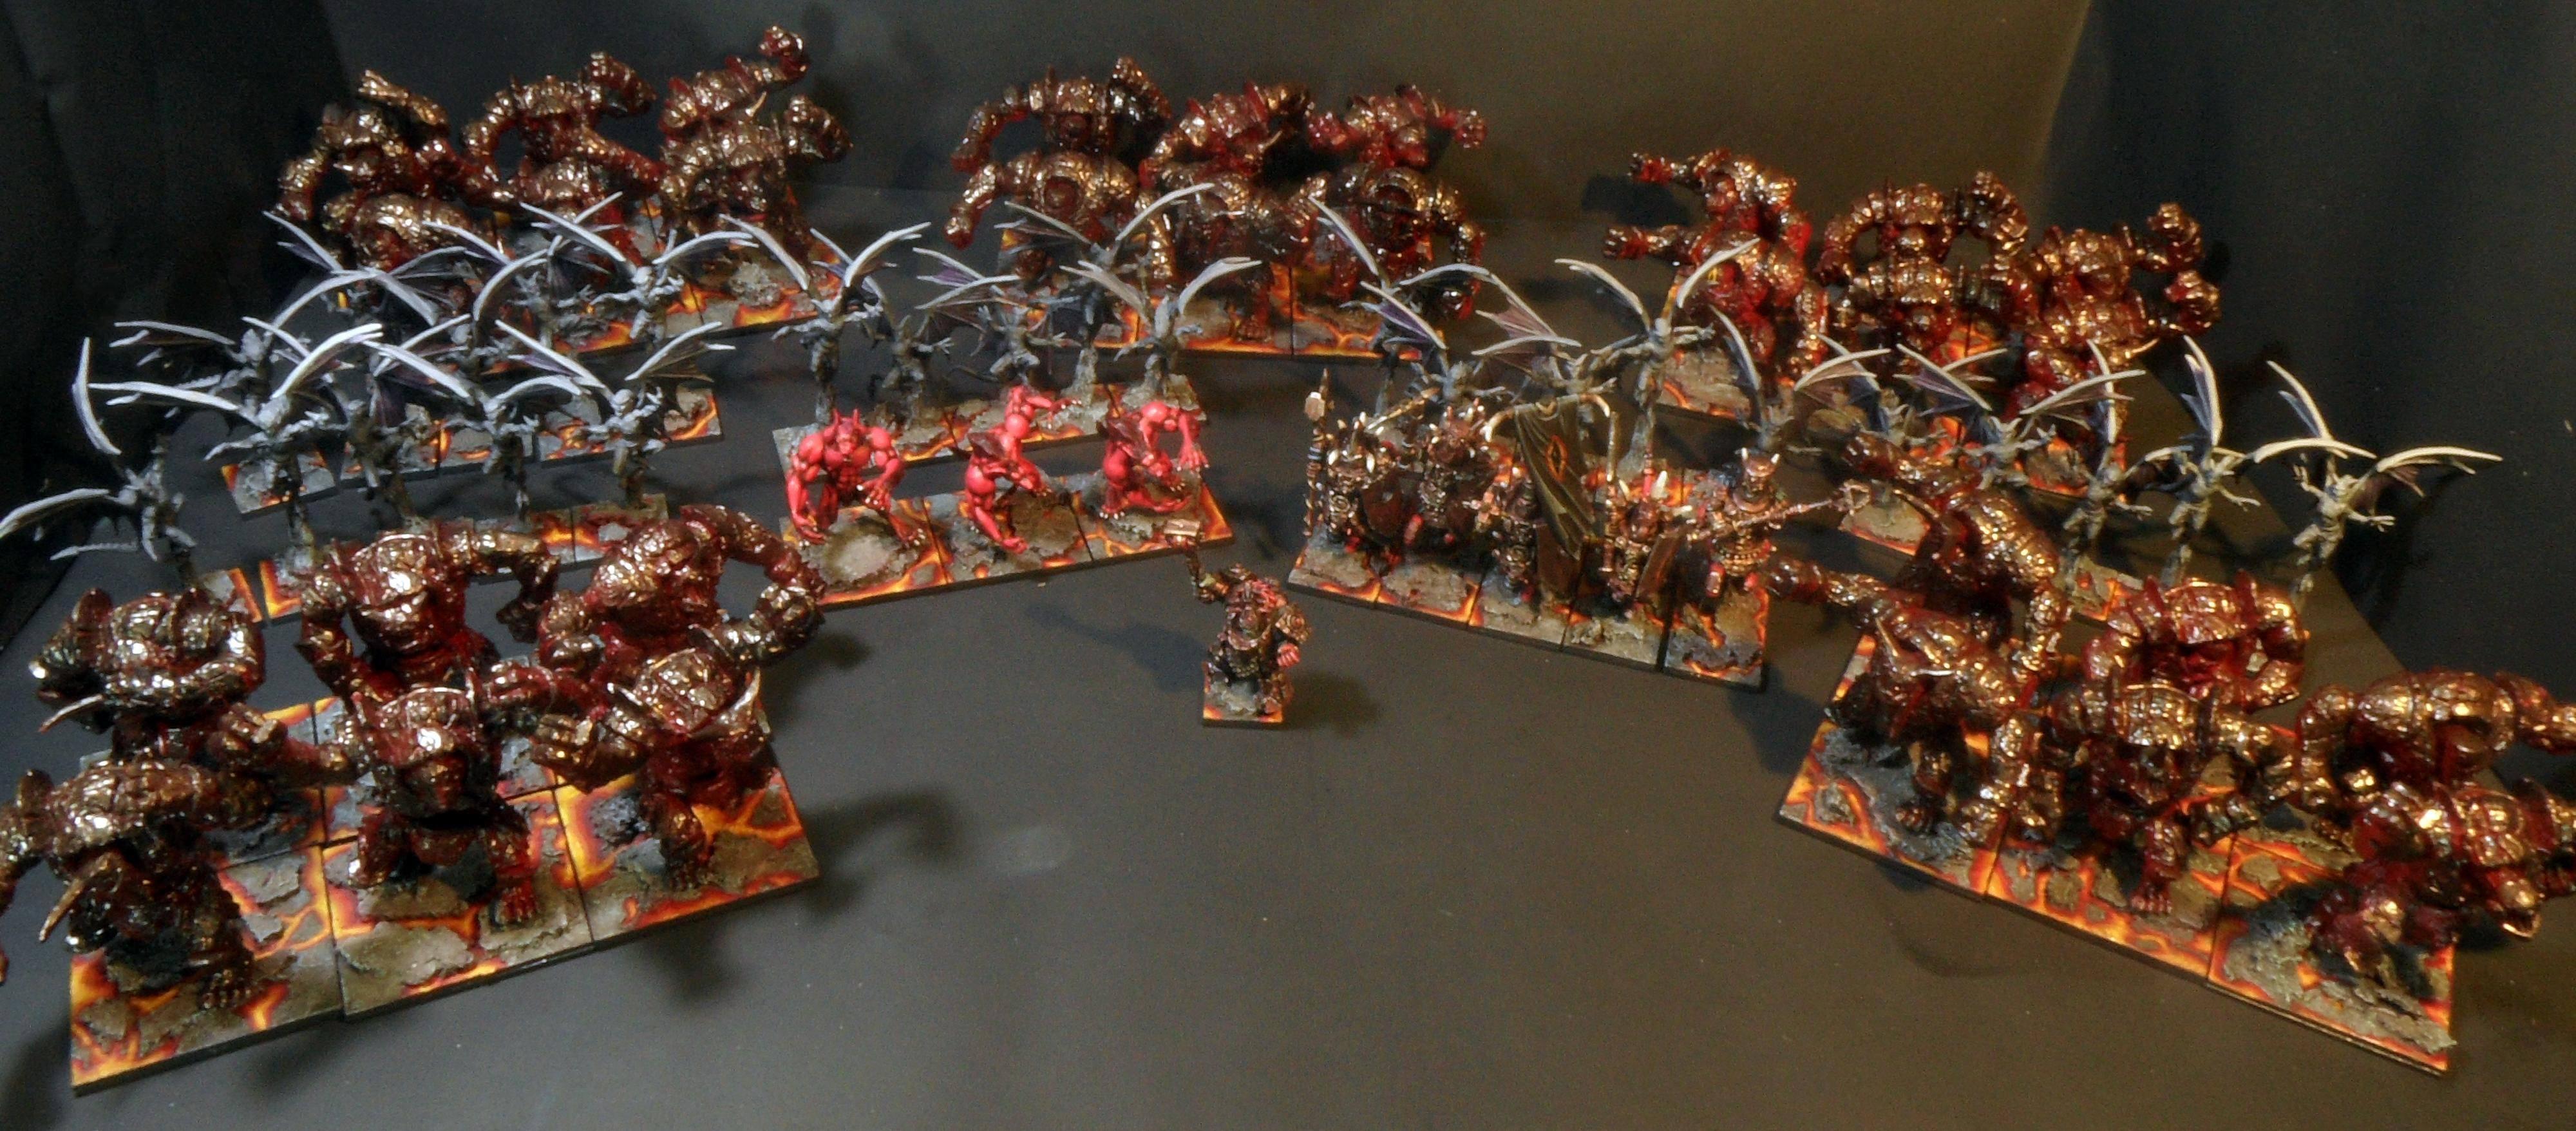 Abyssal, Abyssal Dwarfs, Abyssal Dwarves, Lava, Lordofsmurfs, Mantic, Mantic Games